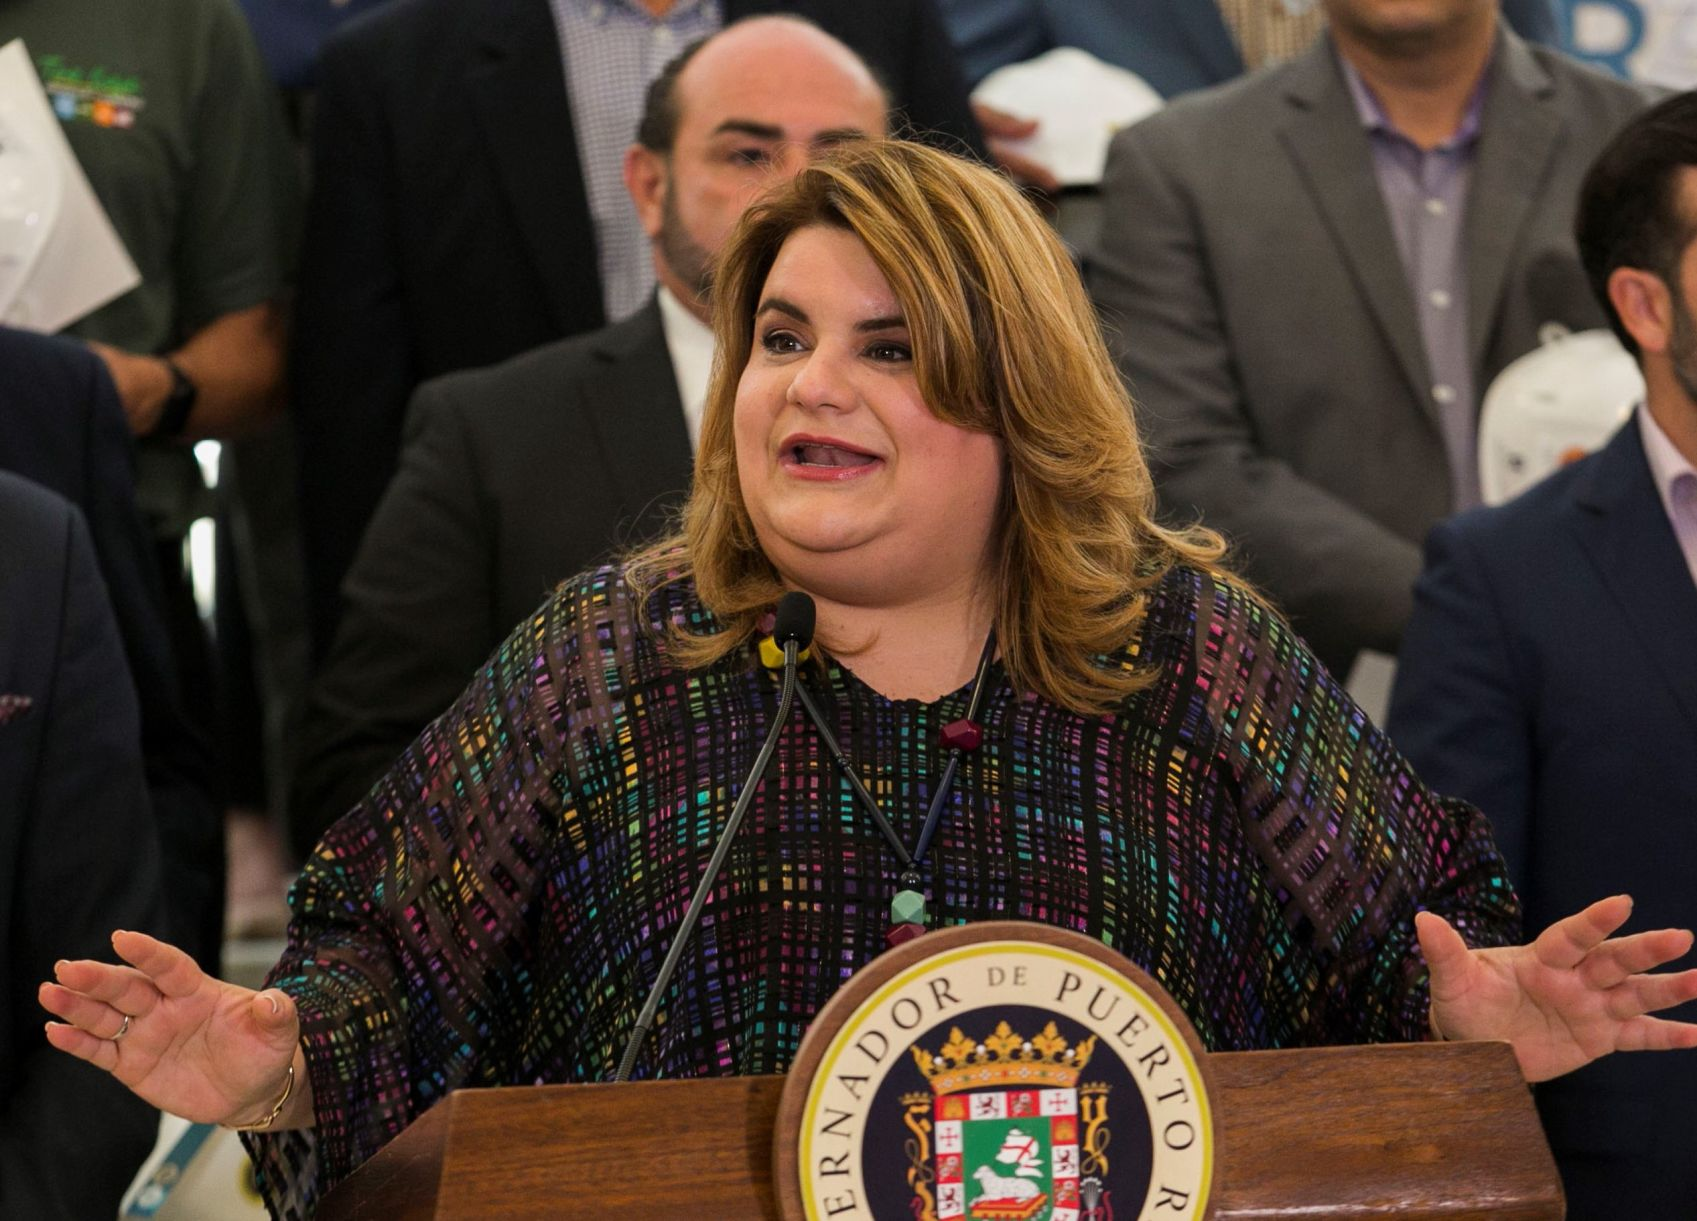 Comisionada residente le pide la renuncia a Rosselló